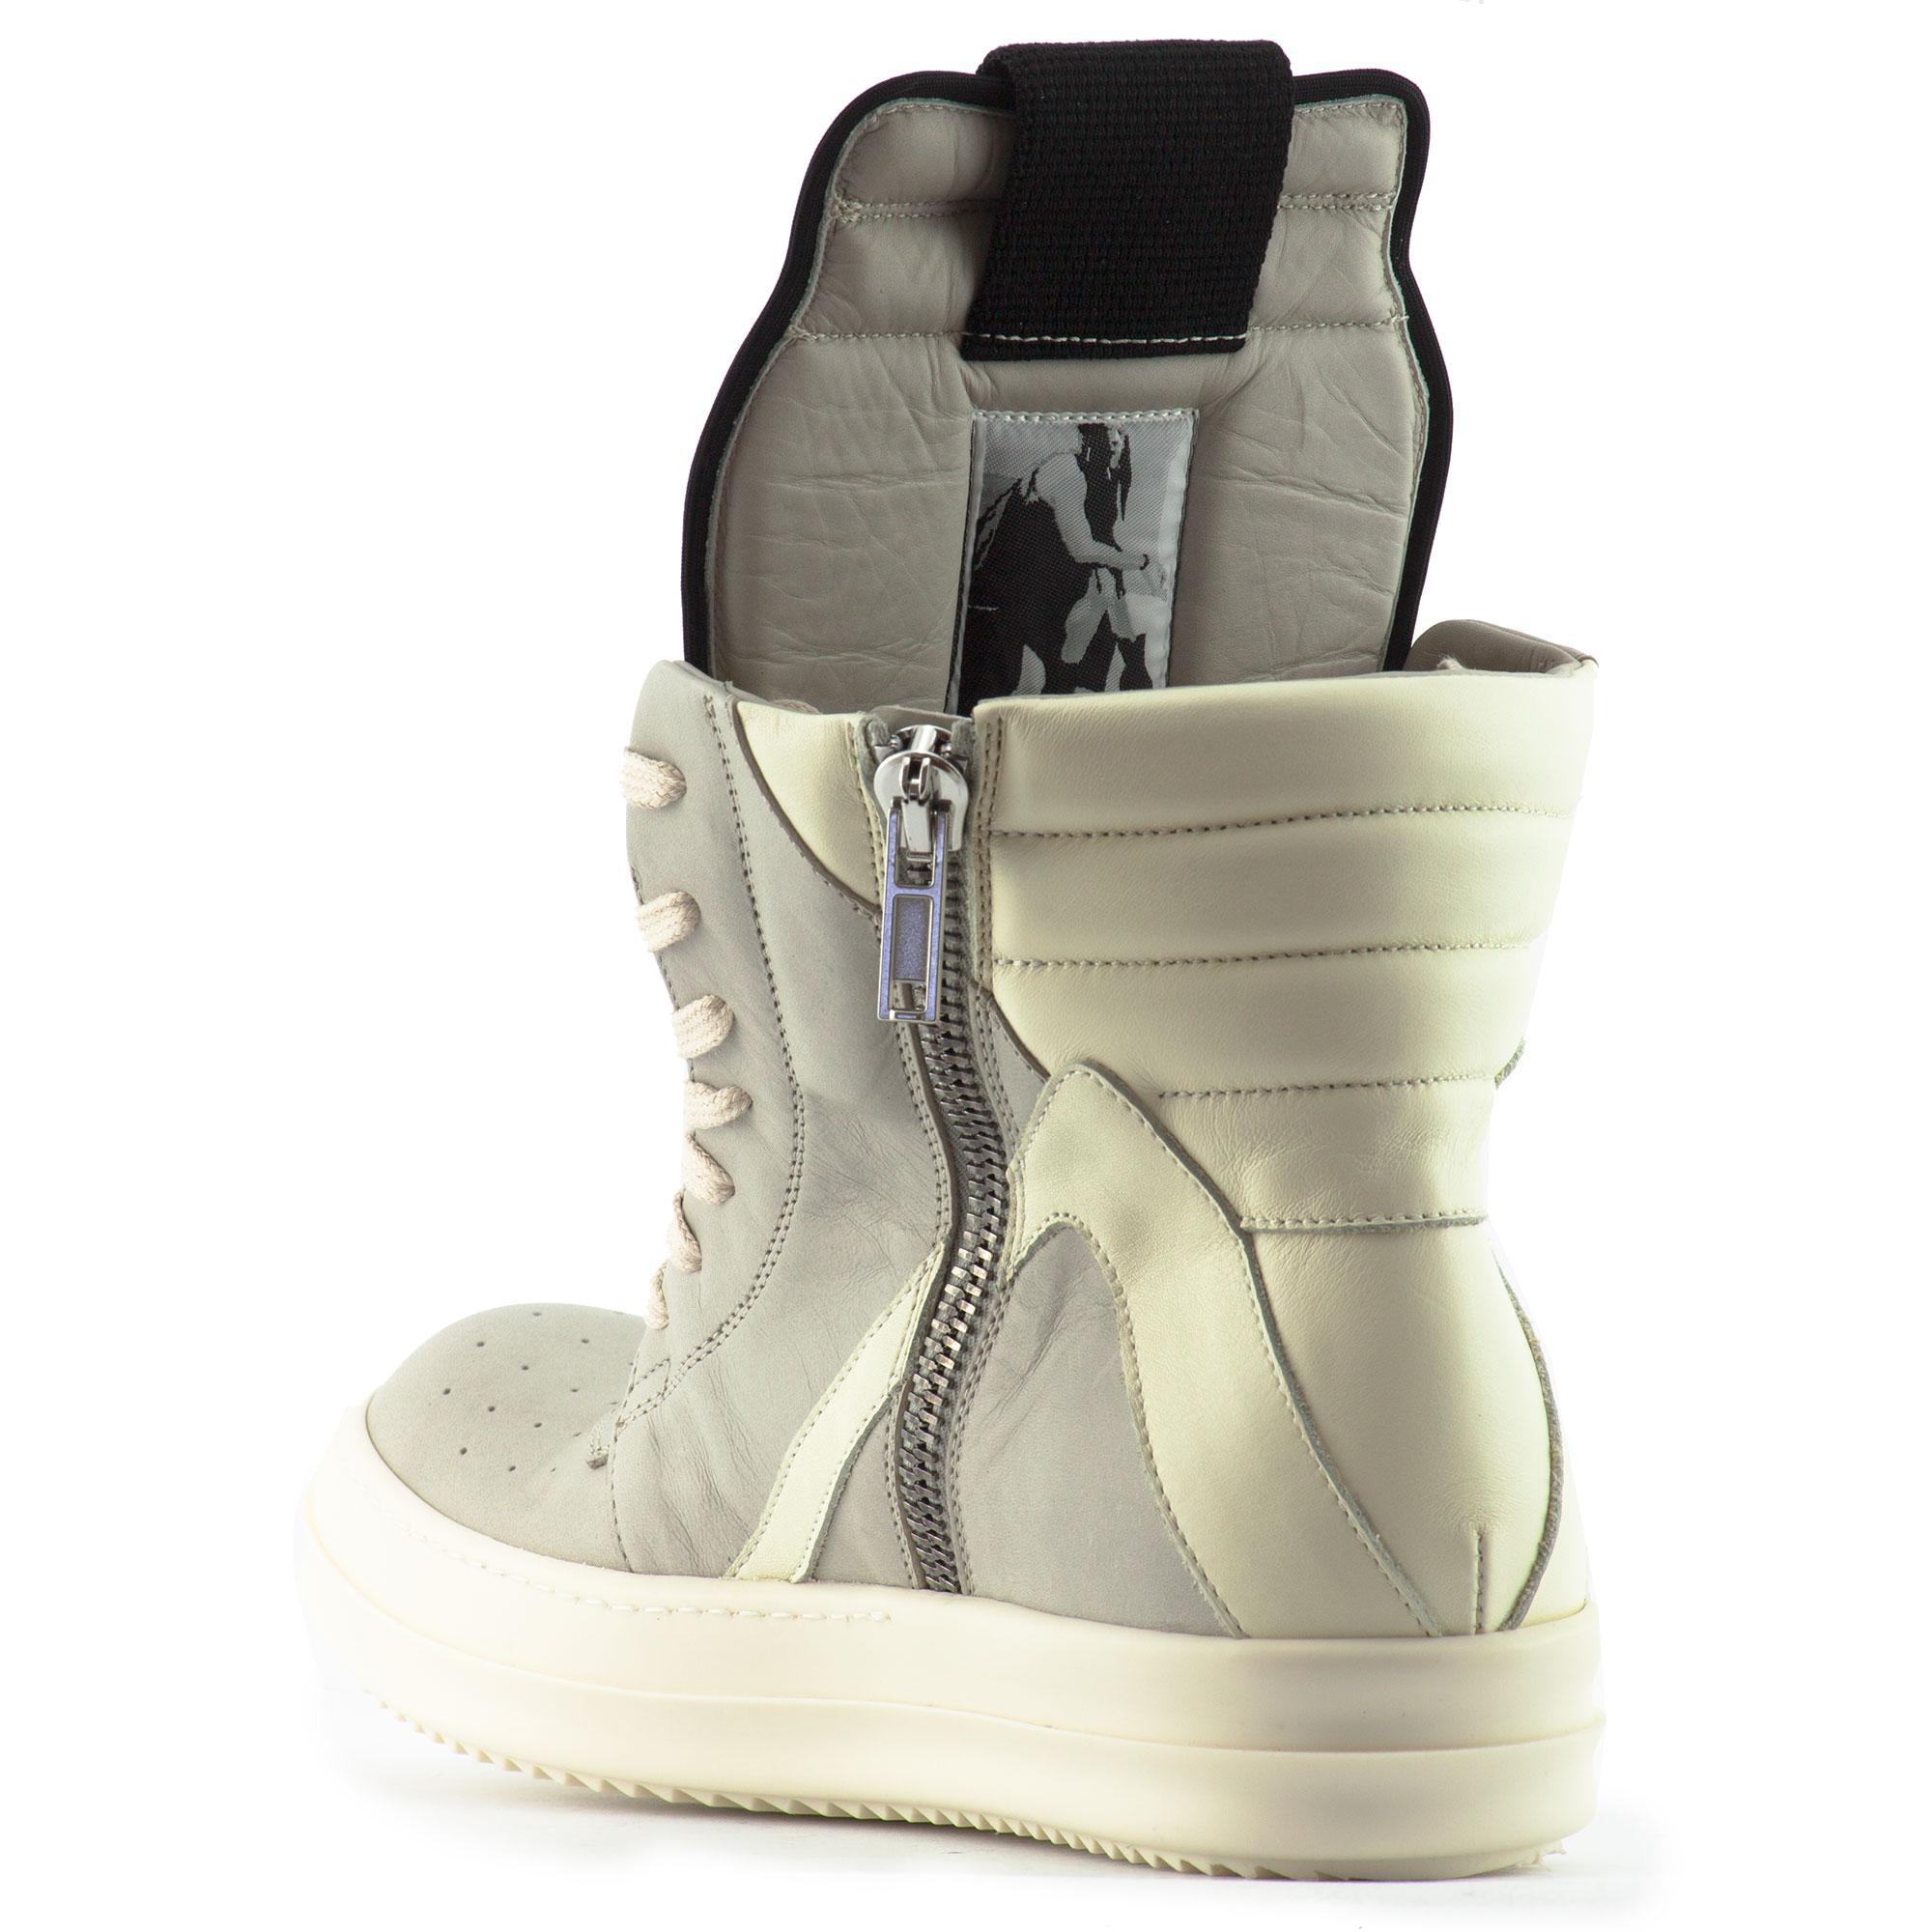 lyst rick owens geobasket leather sneakers. Black Bedroom Furniture Sets. Home Design Ideas